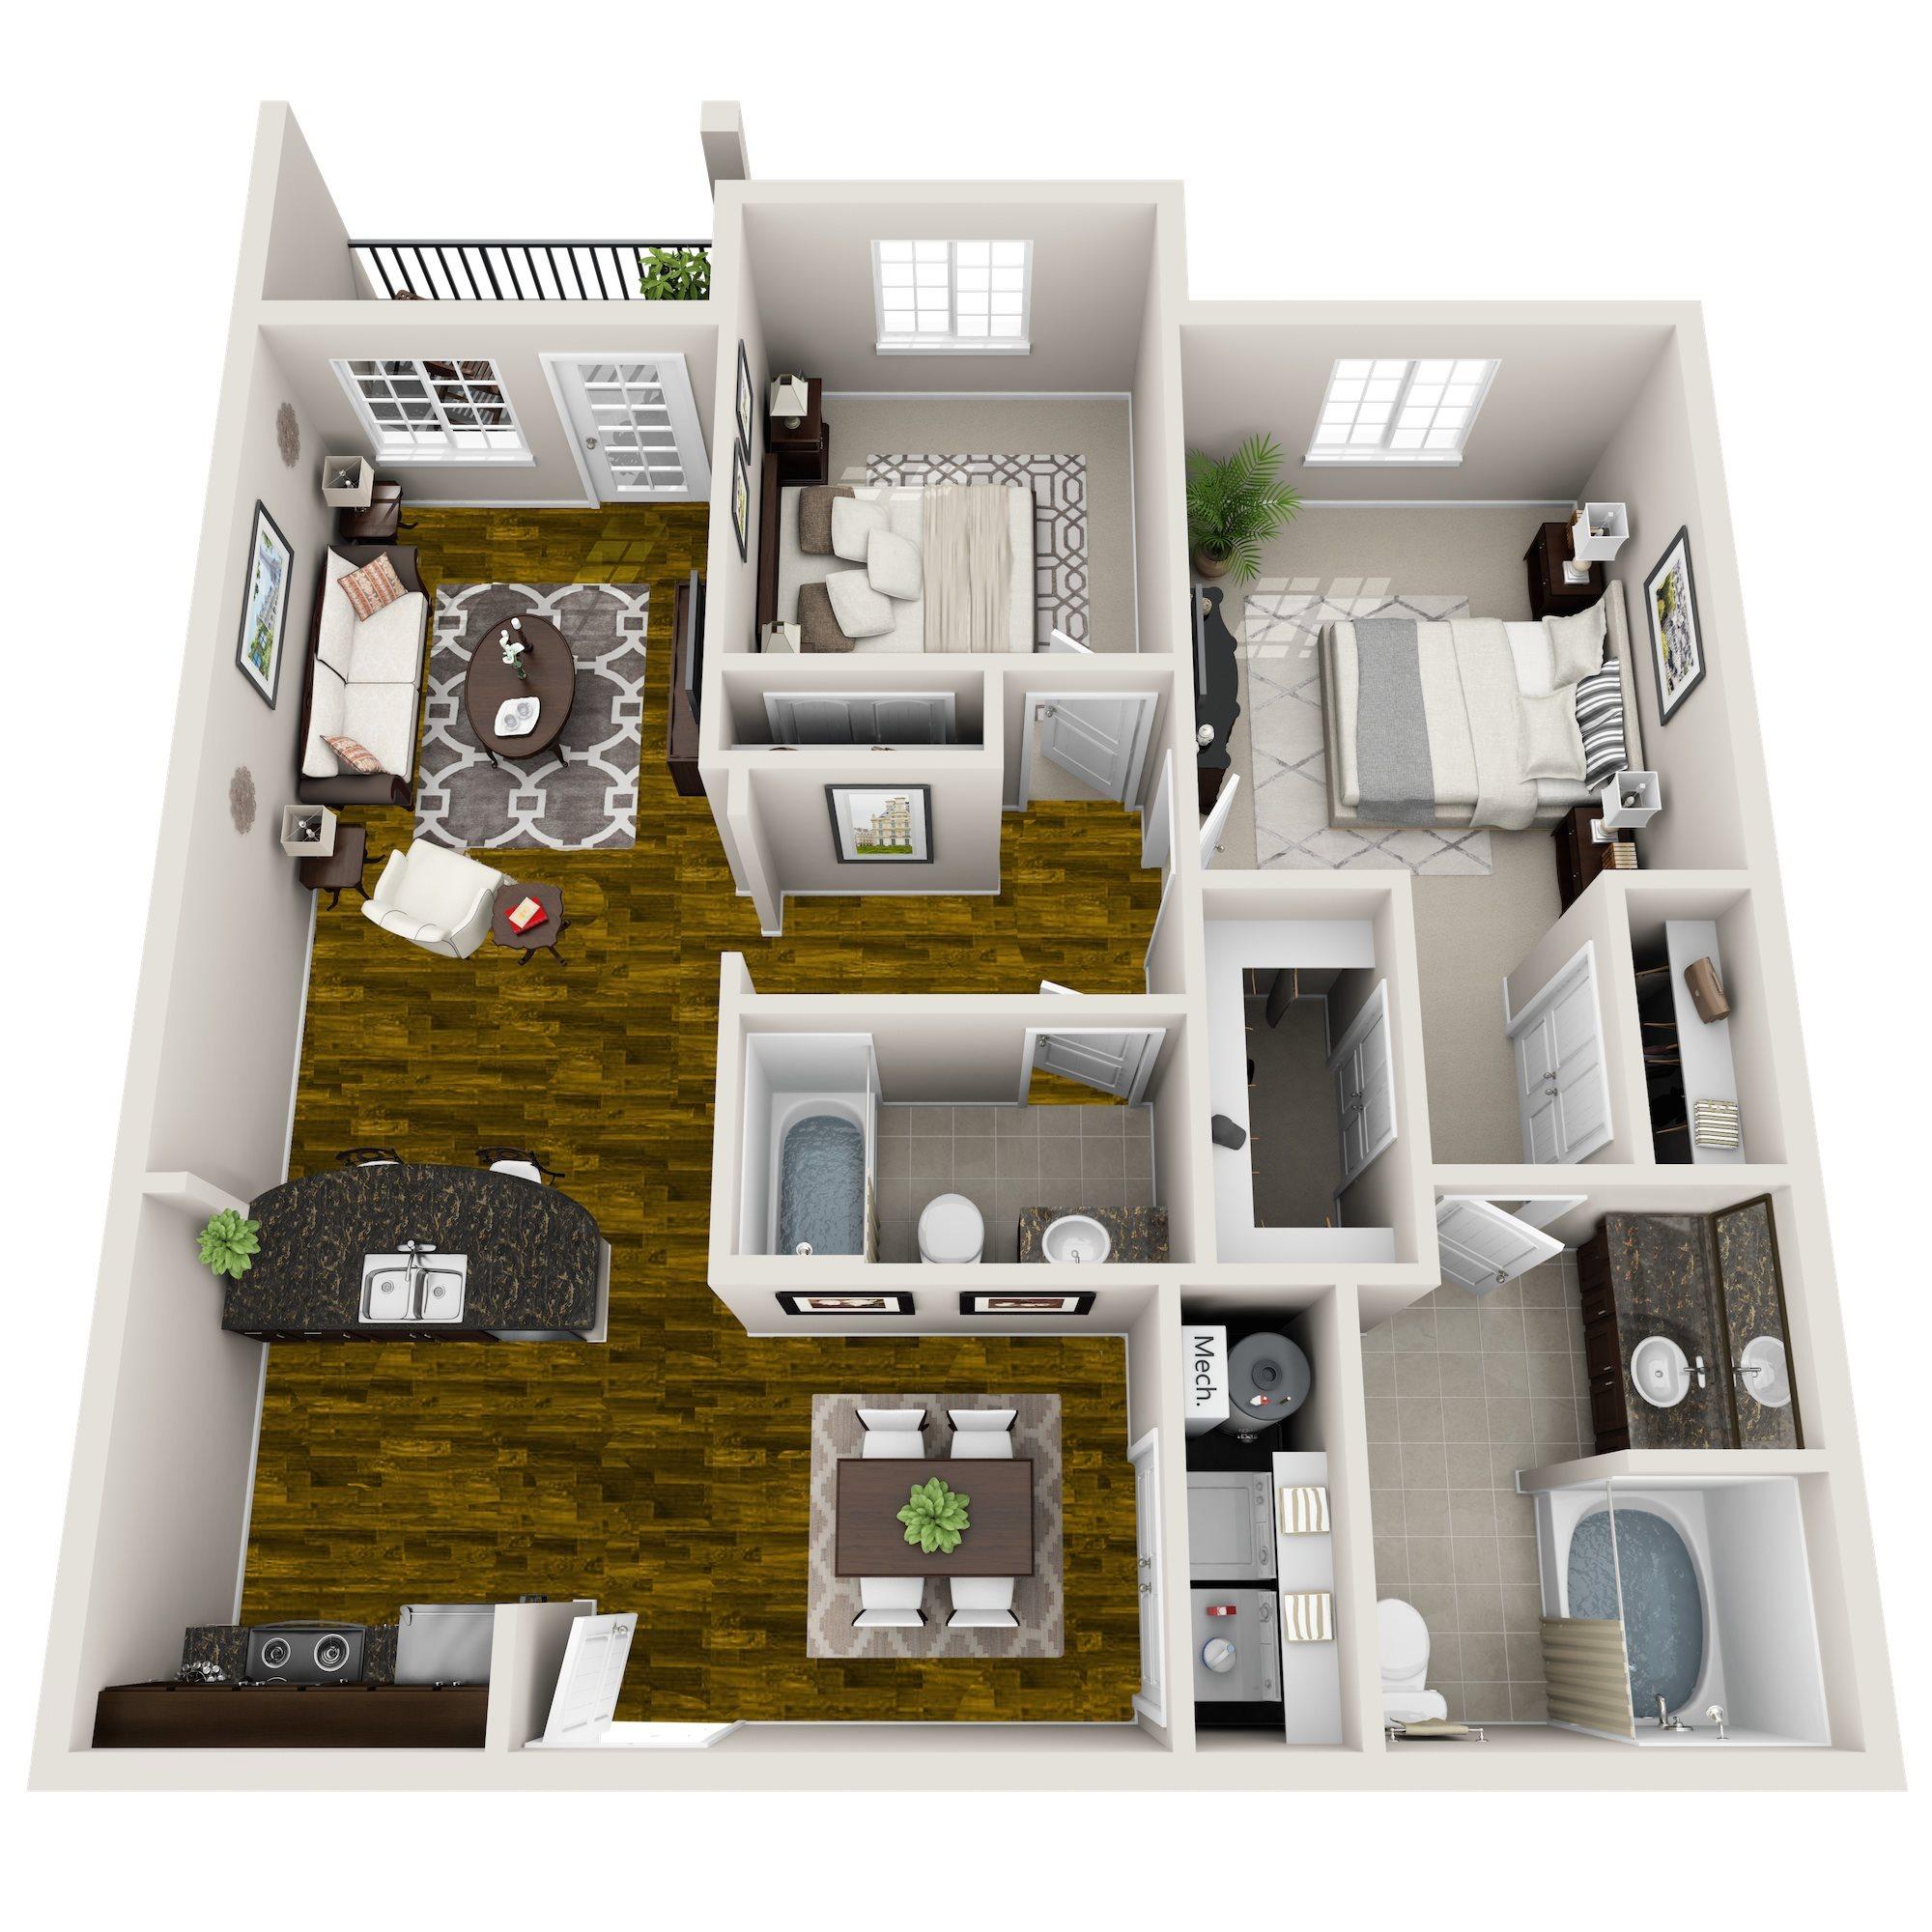 Sierra Ranch Apartments: 1, 2 & 3-Bedroom Apartments In Austin, TX